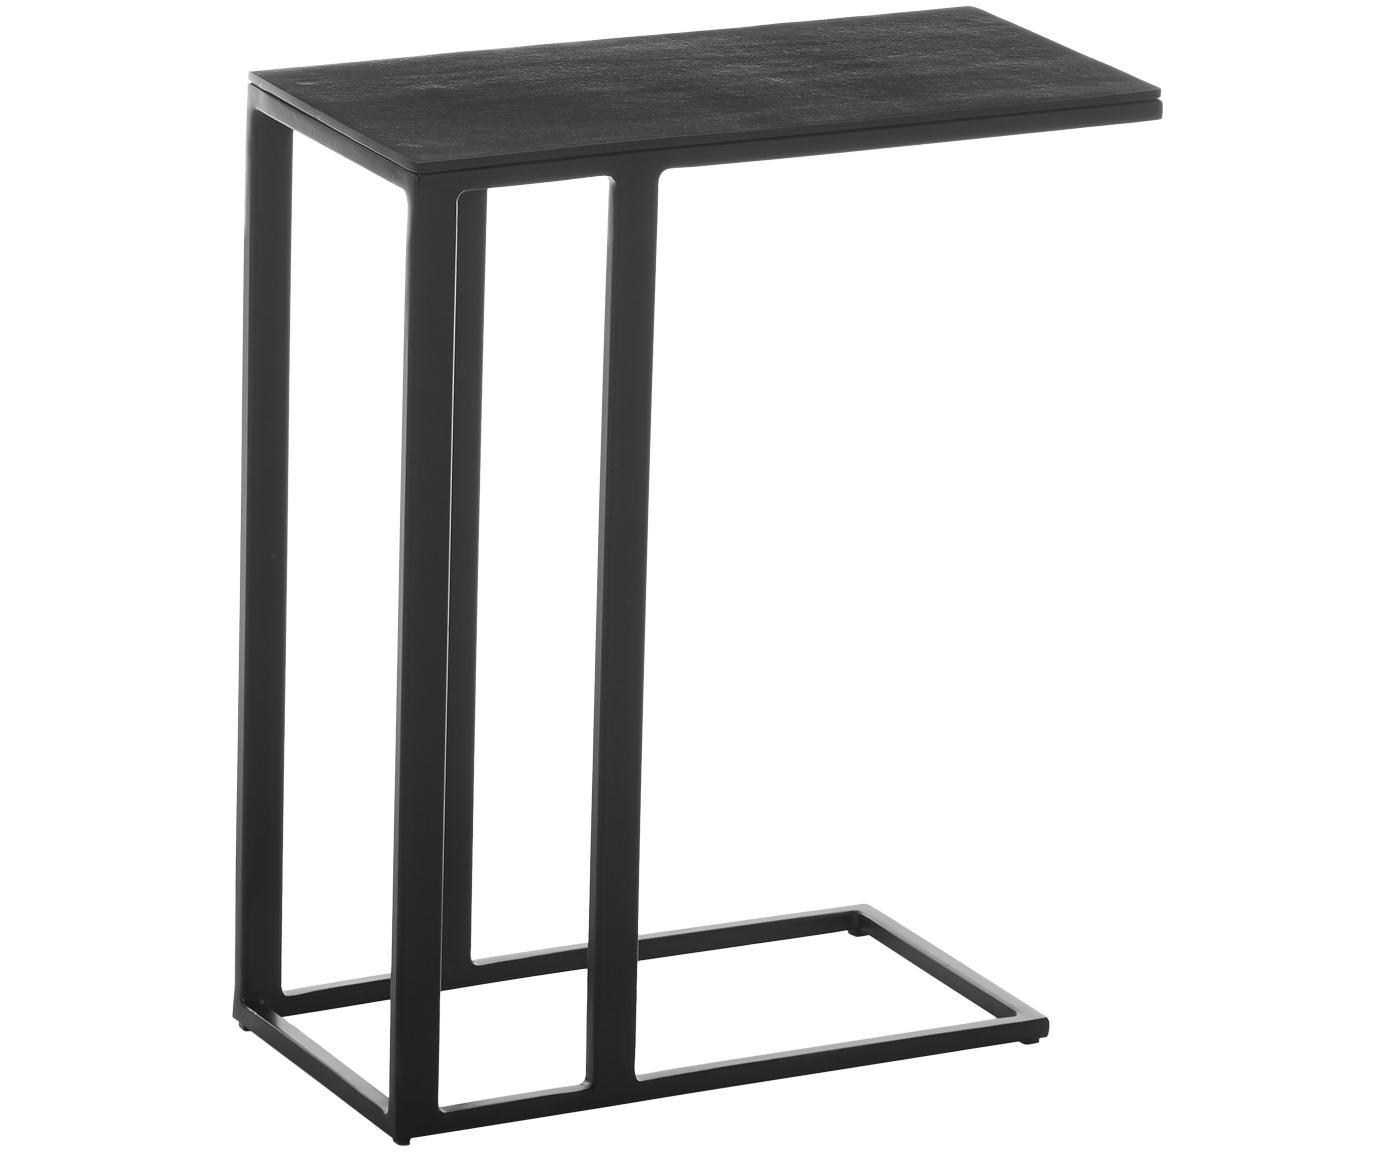 Beistelltisch Edge im Industrial Design, Tischplatte: Metall, beschichtet, Gestell: Metall, pulverbeschichtet, Tischplatte: Schwarz Gestell: Schwarz, matt, 43 x 52 cm